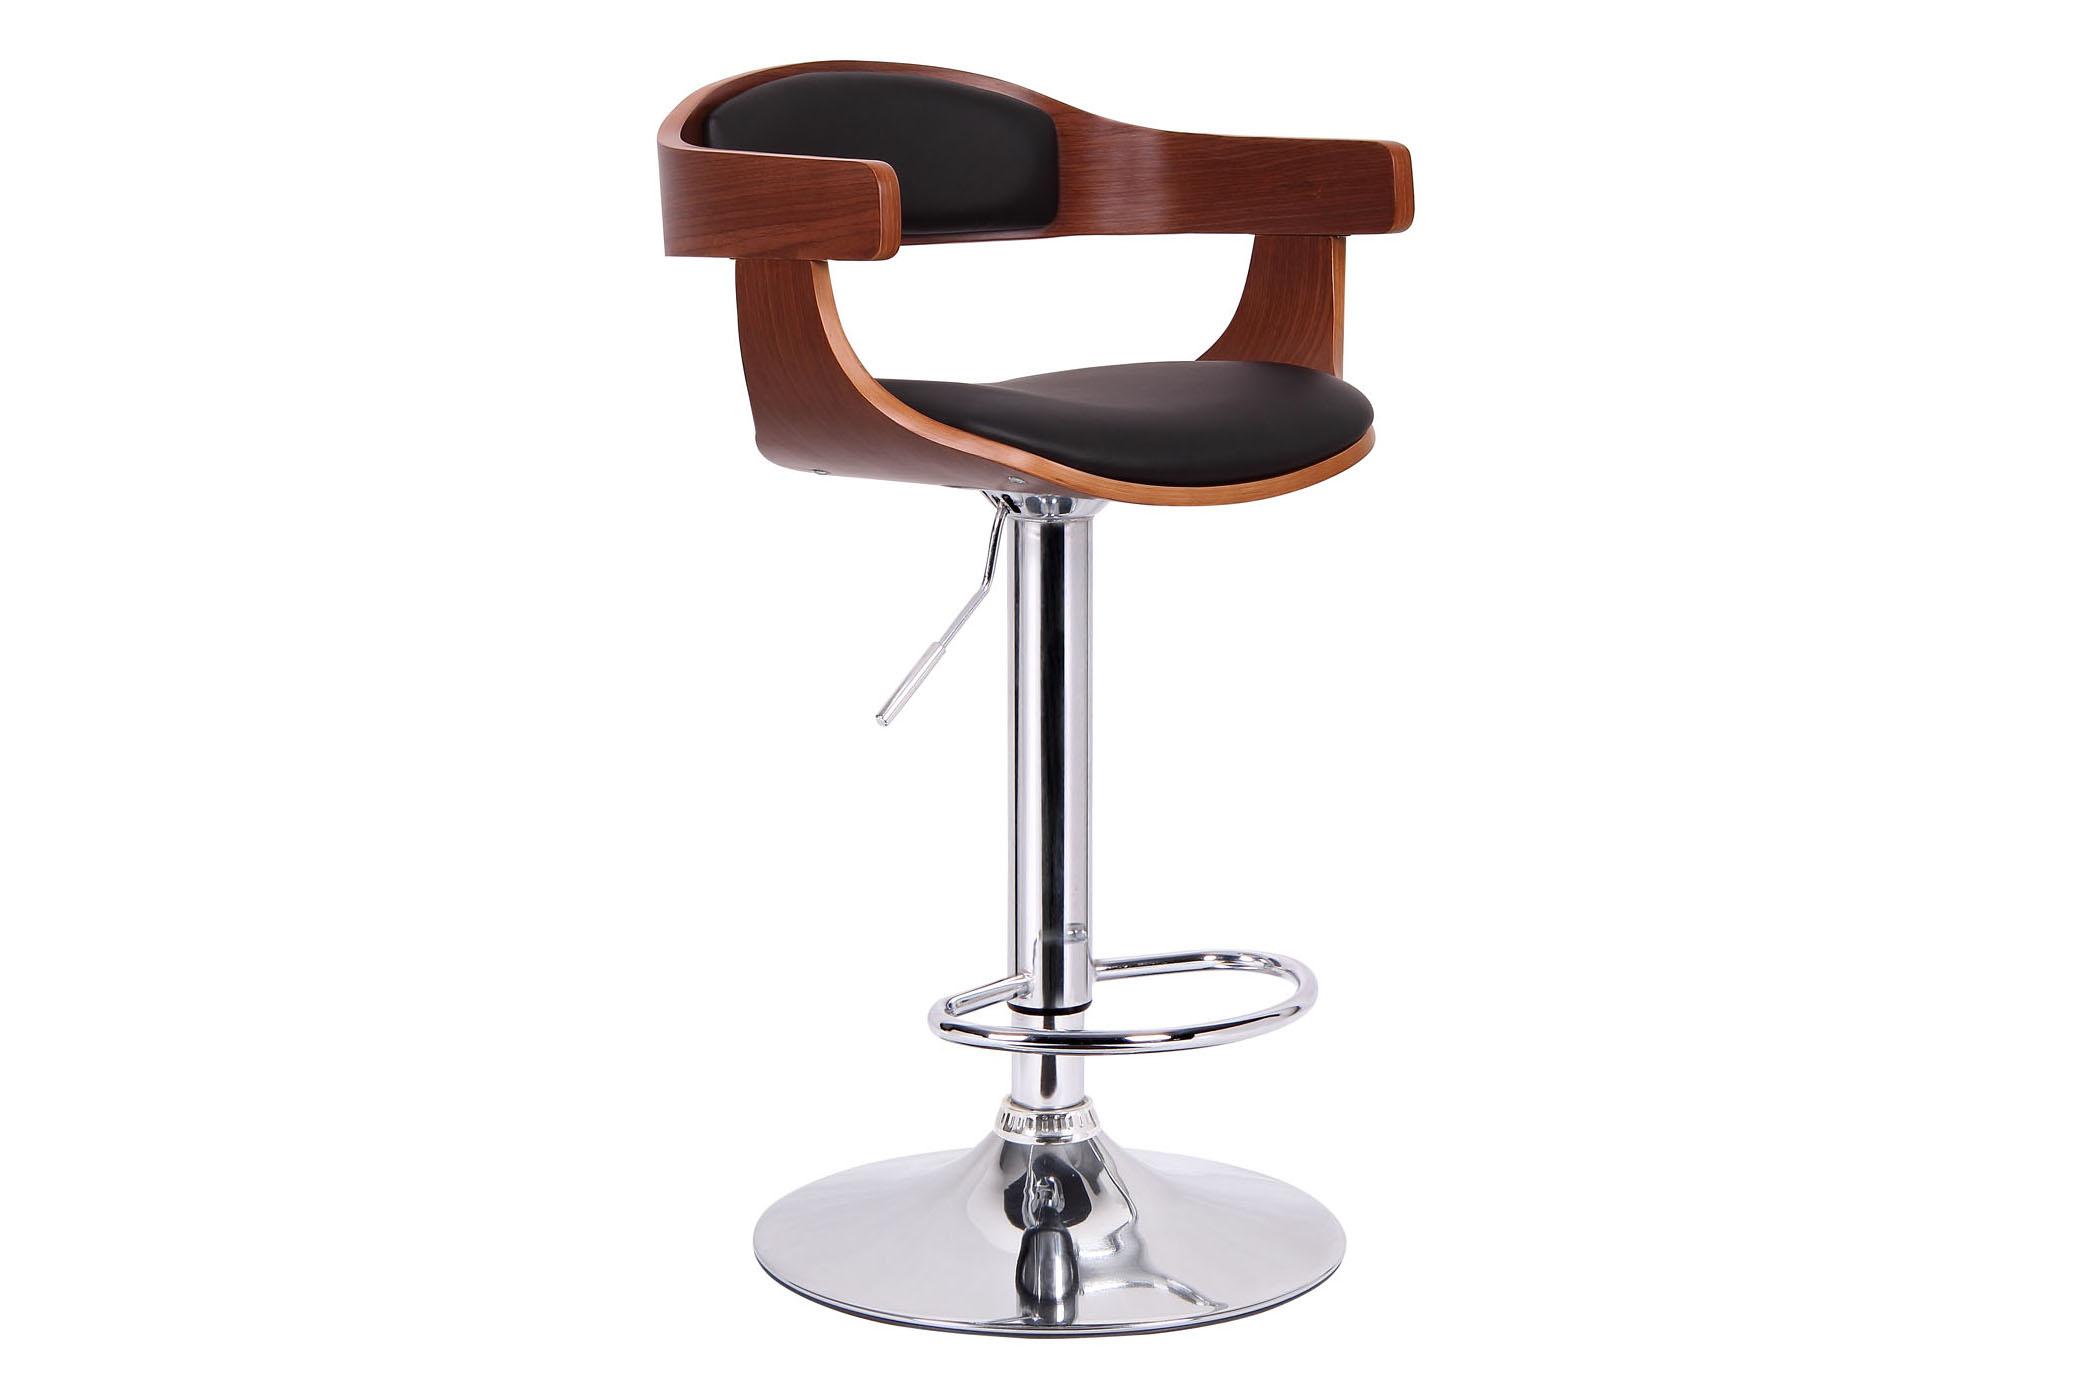 Strange Garr Walnut And Black Modern Bar Stool Affordable Modern Andrewgaddart Wooden Chair Designs For Living Room Andrewgaddartcom